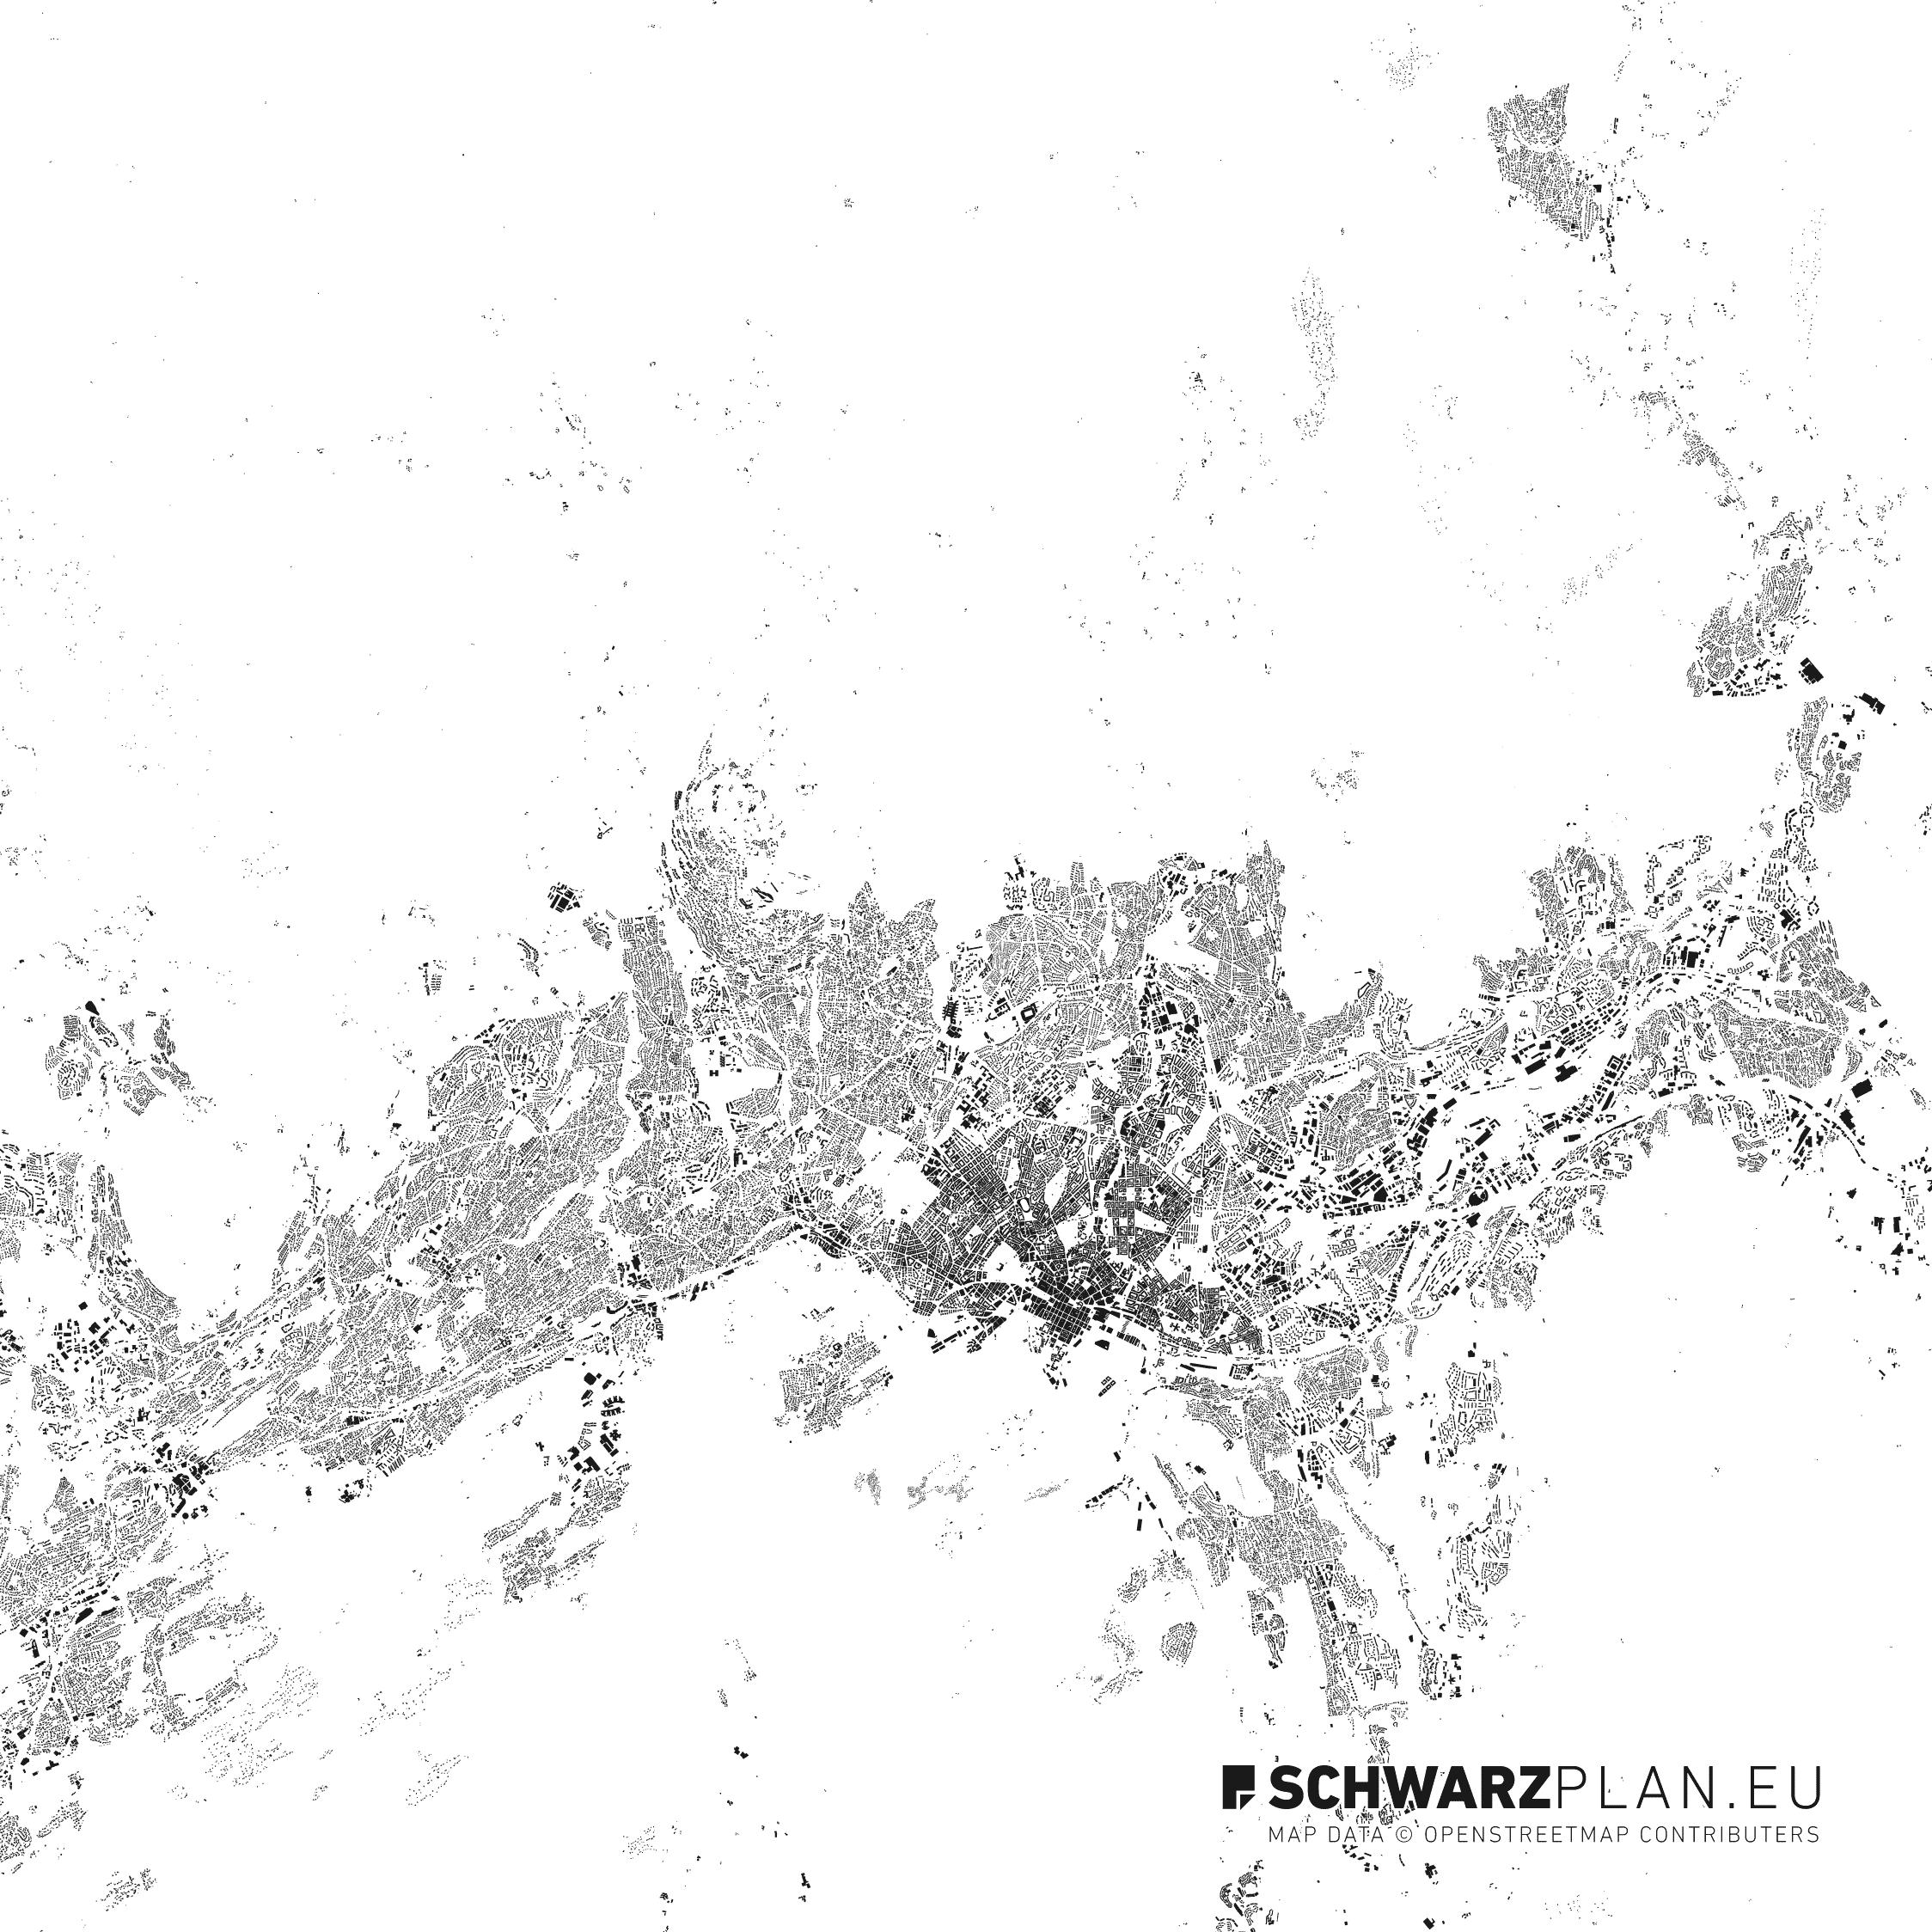 Figure ground plan of Oslo